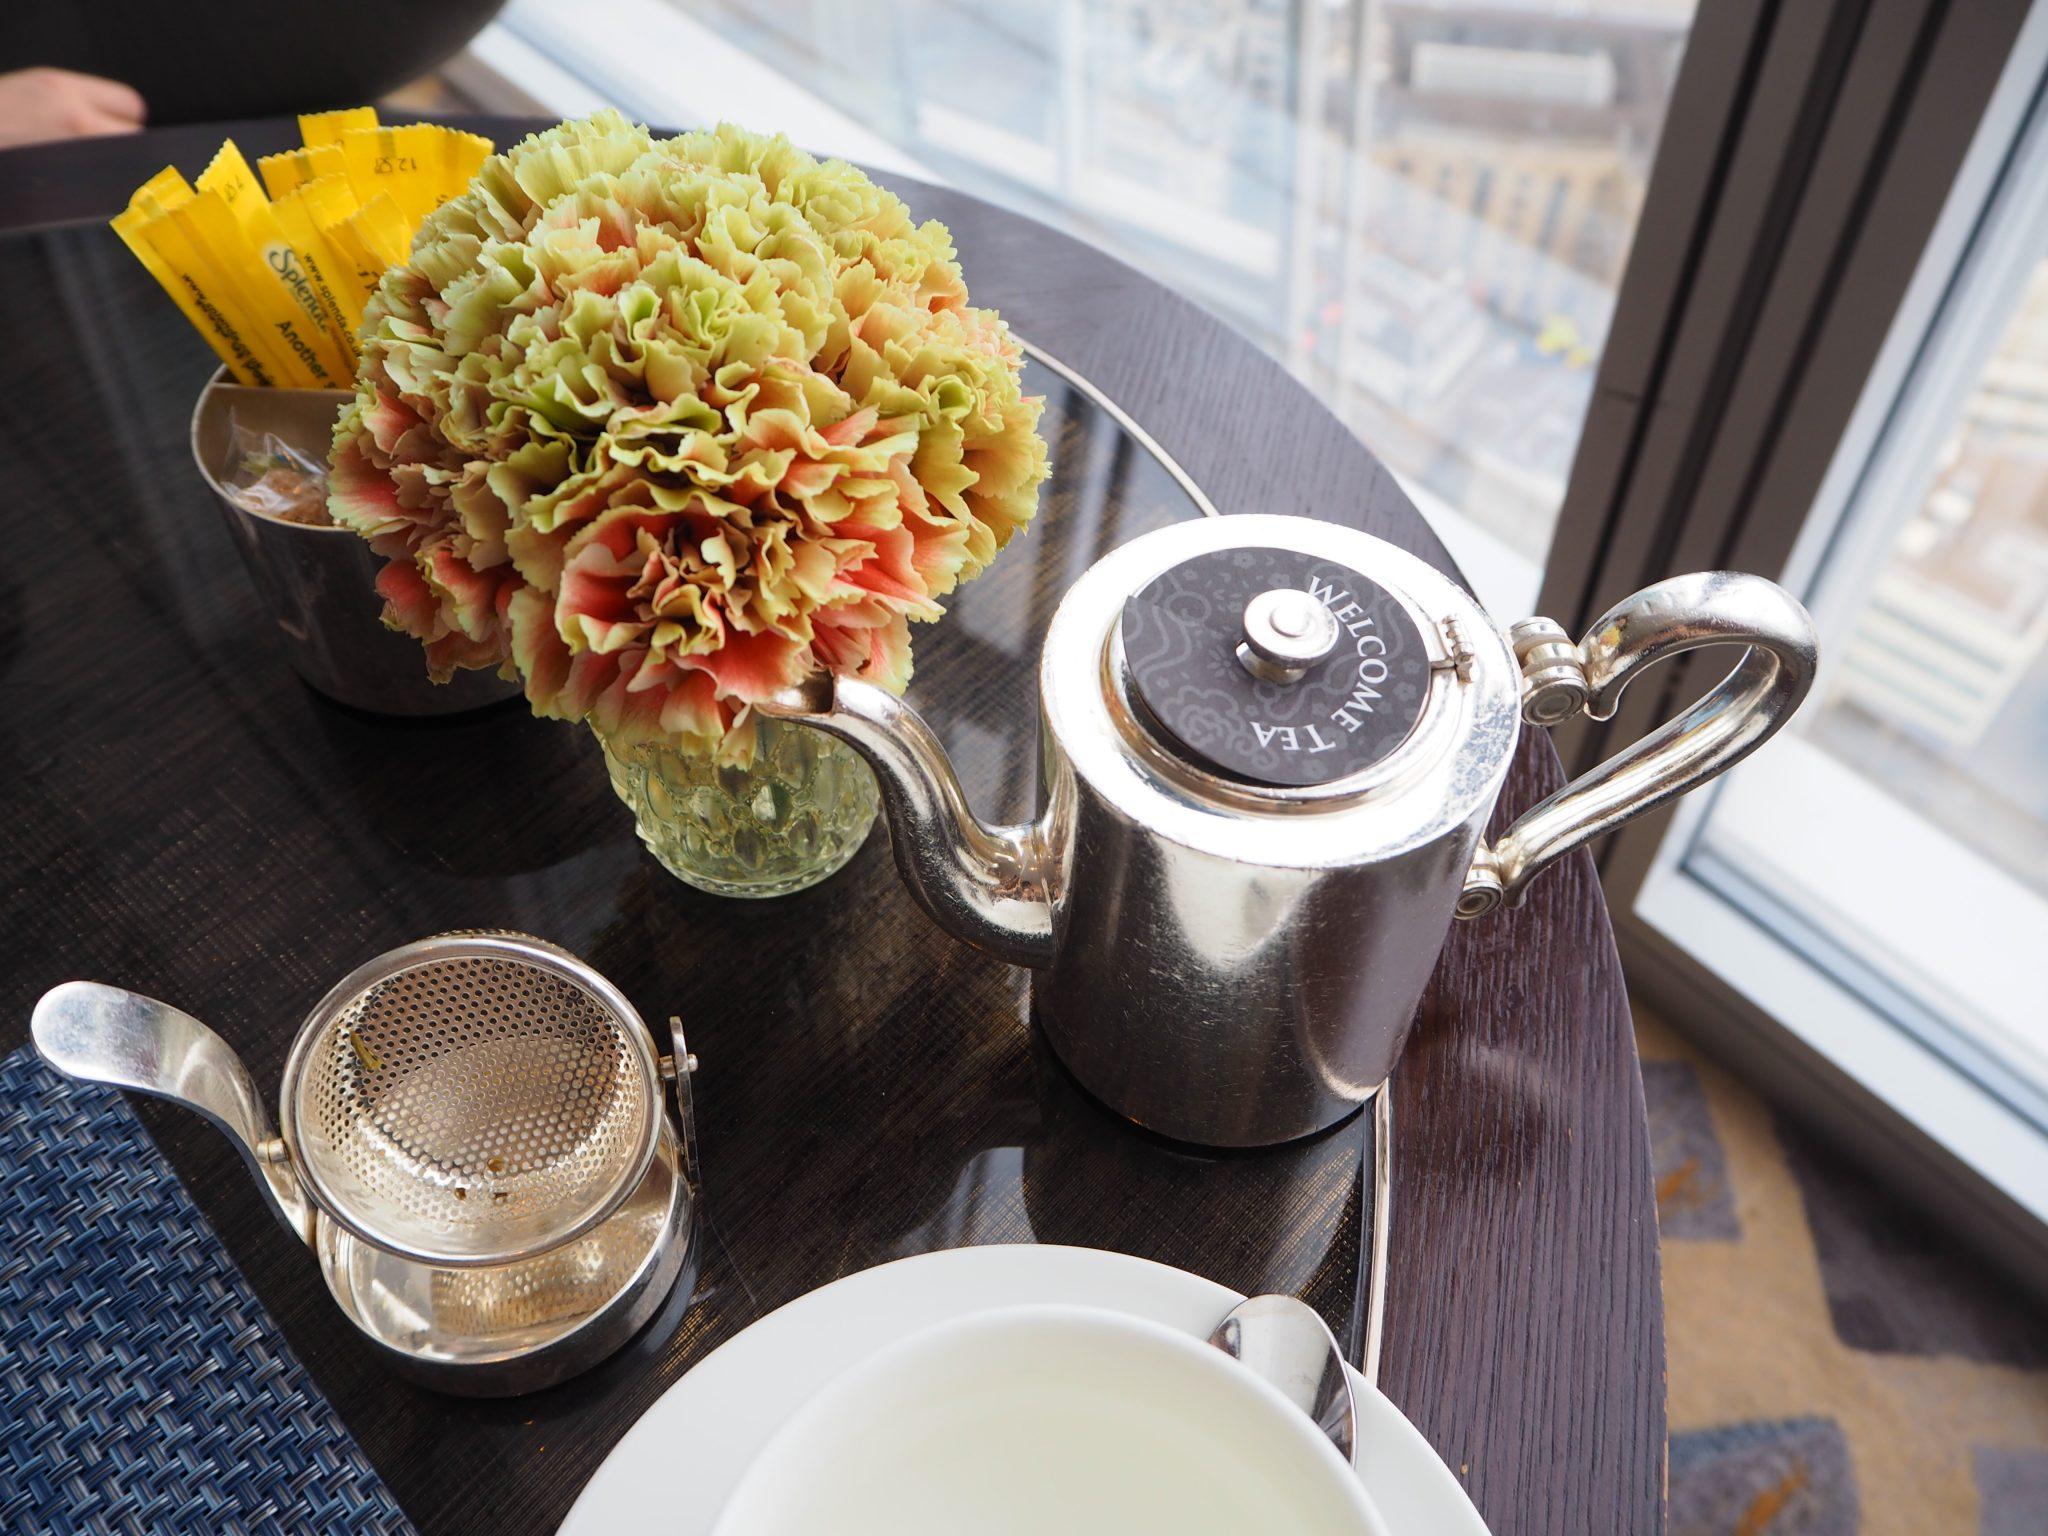 Shangri-La at the Shard - Tea